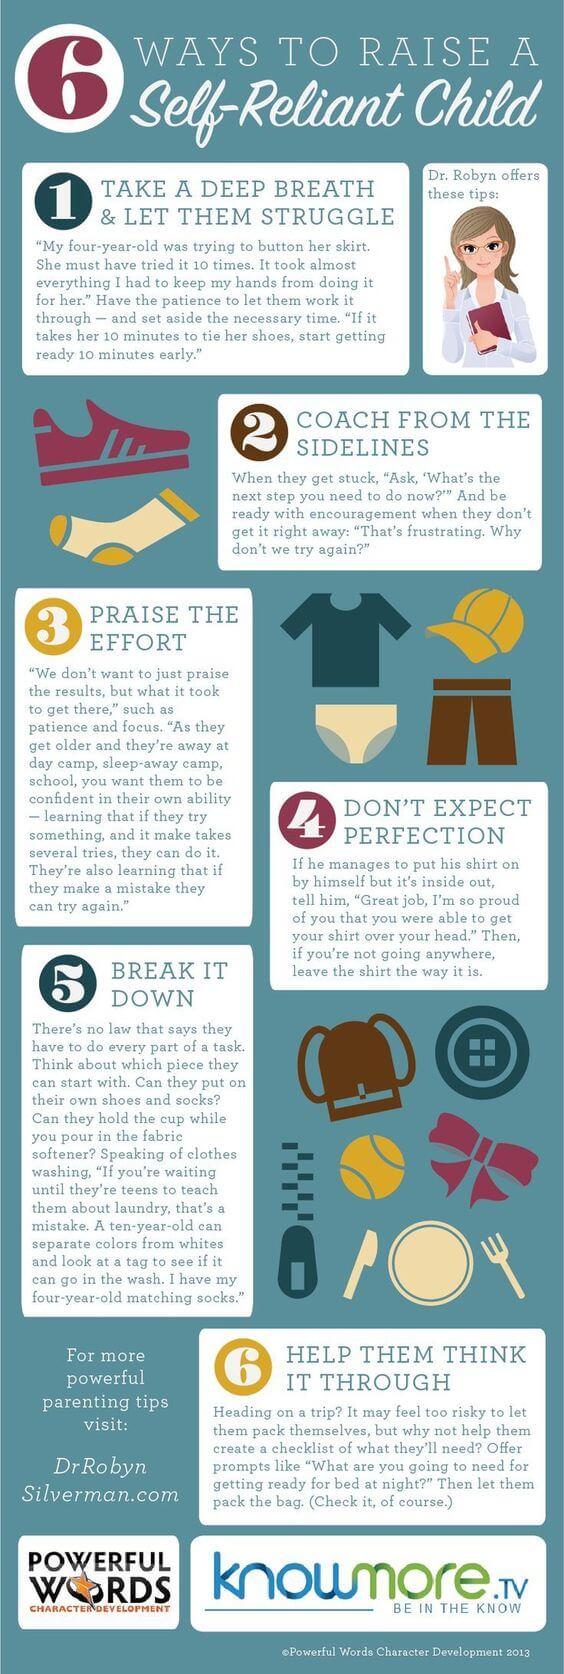 6 Ways to Raise a Self-reliant Child